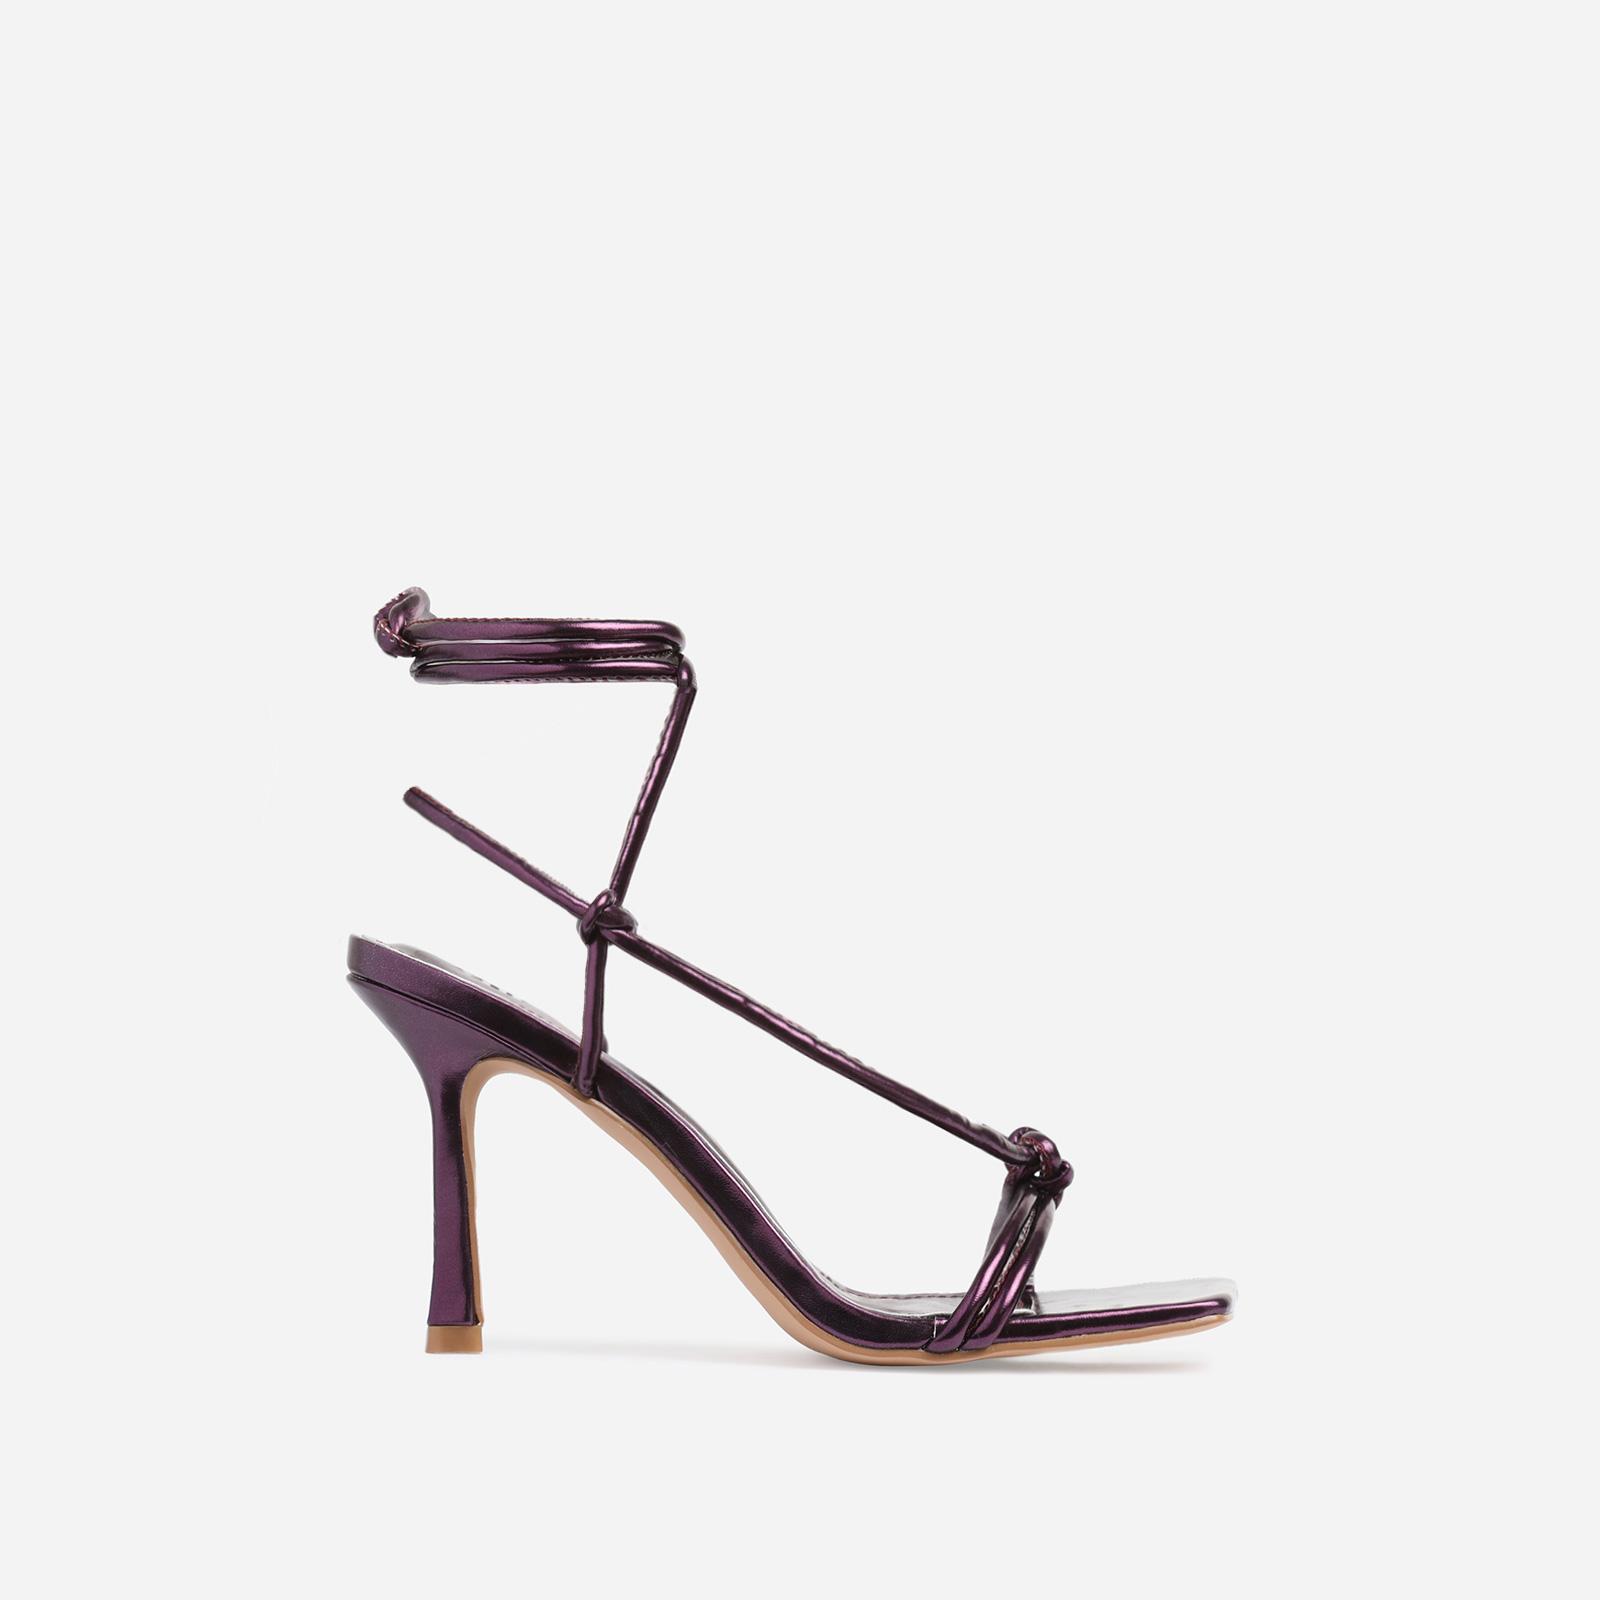 Priya Square Toe Lace Up Heel In Metallic Purple Faux Leather